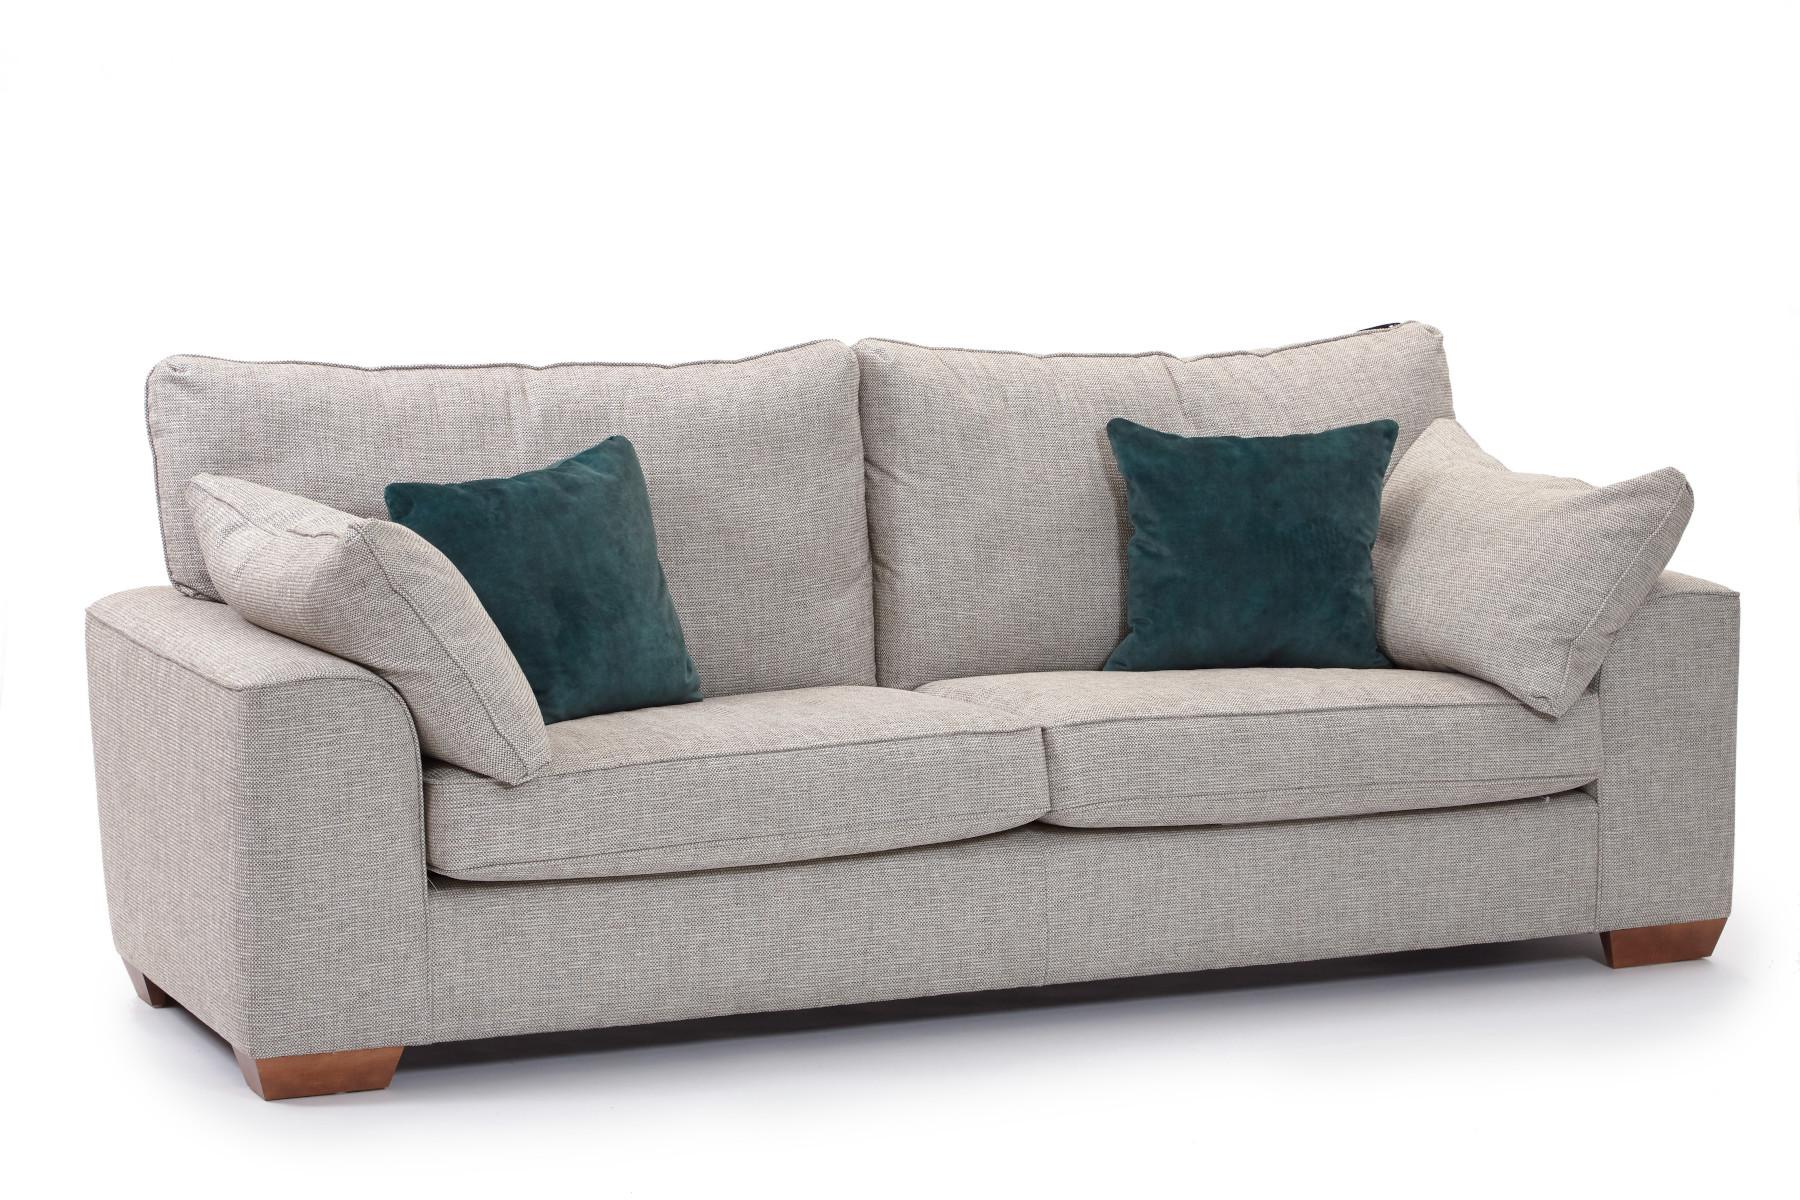 Presley Grand Sofa